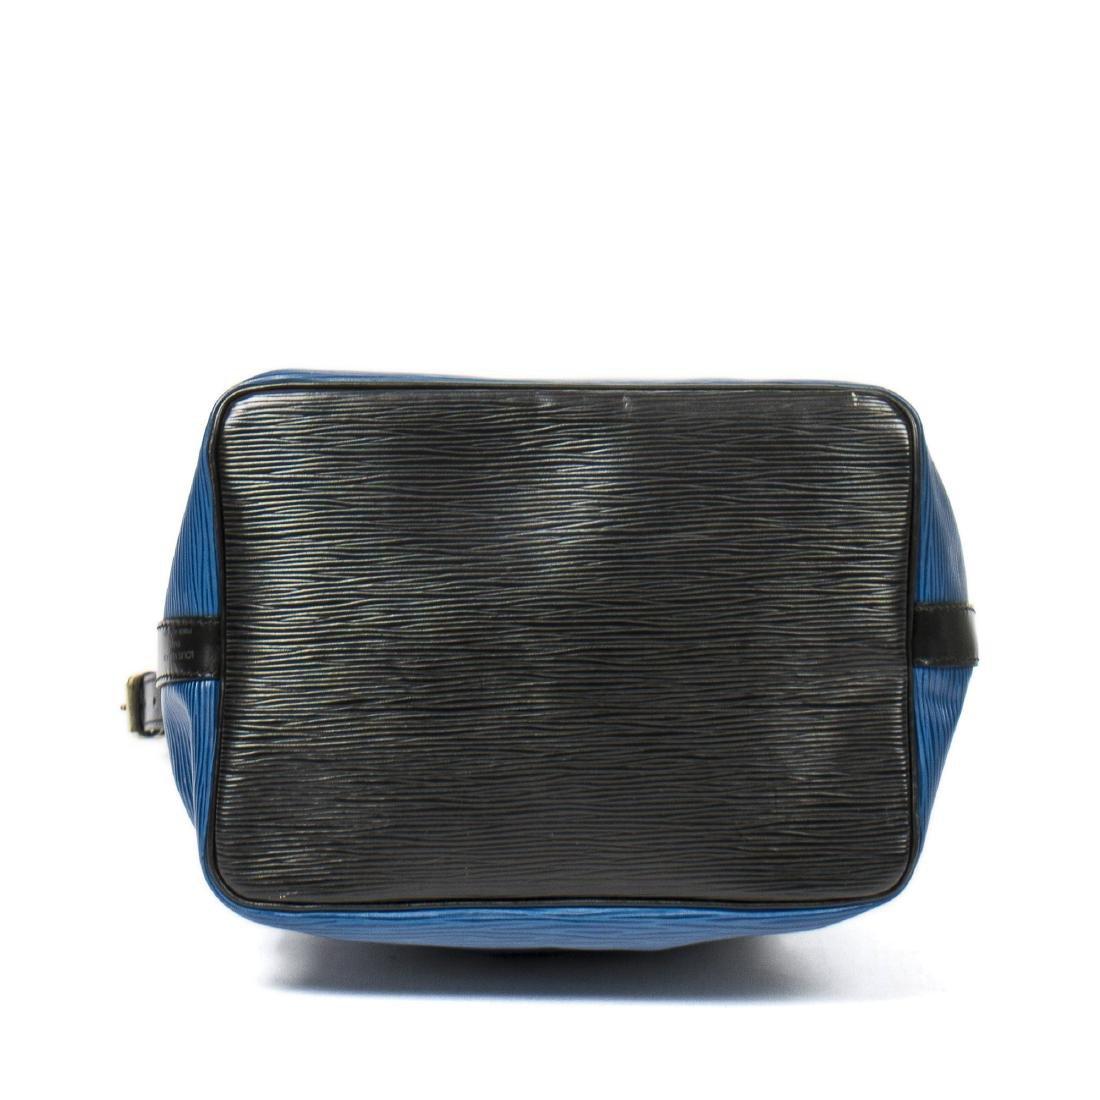 Louis Vuitton Noe Bicolor - 6